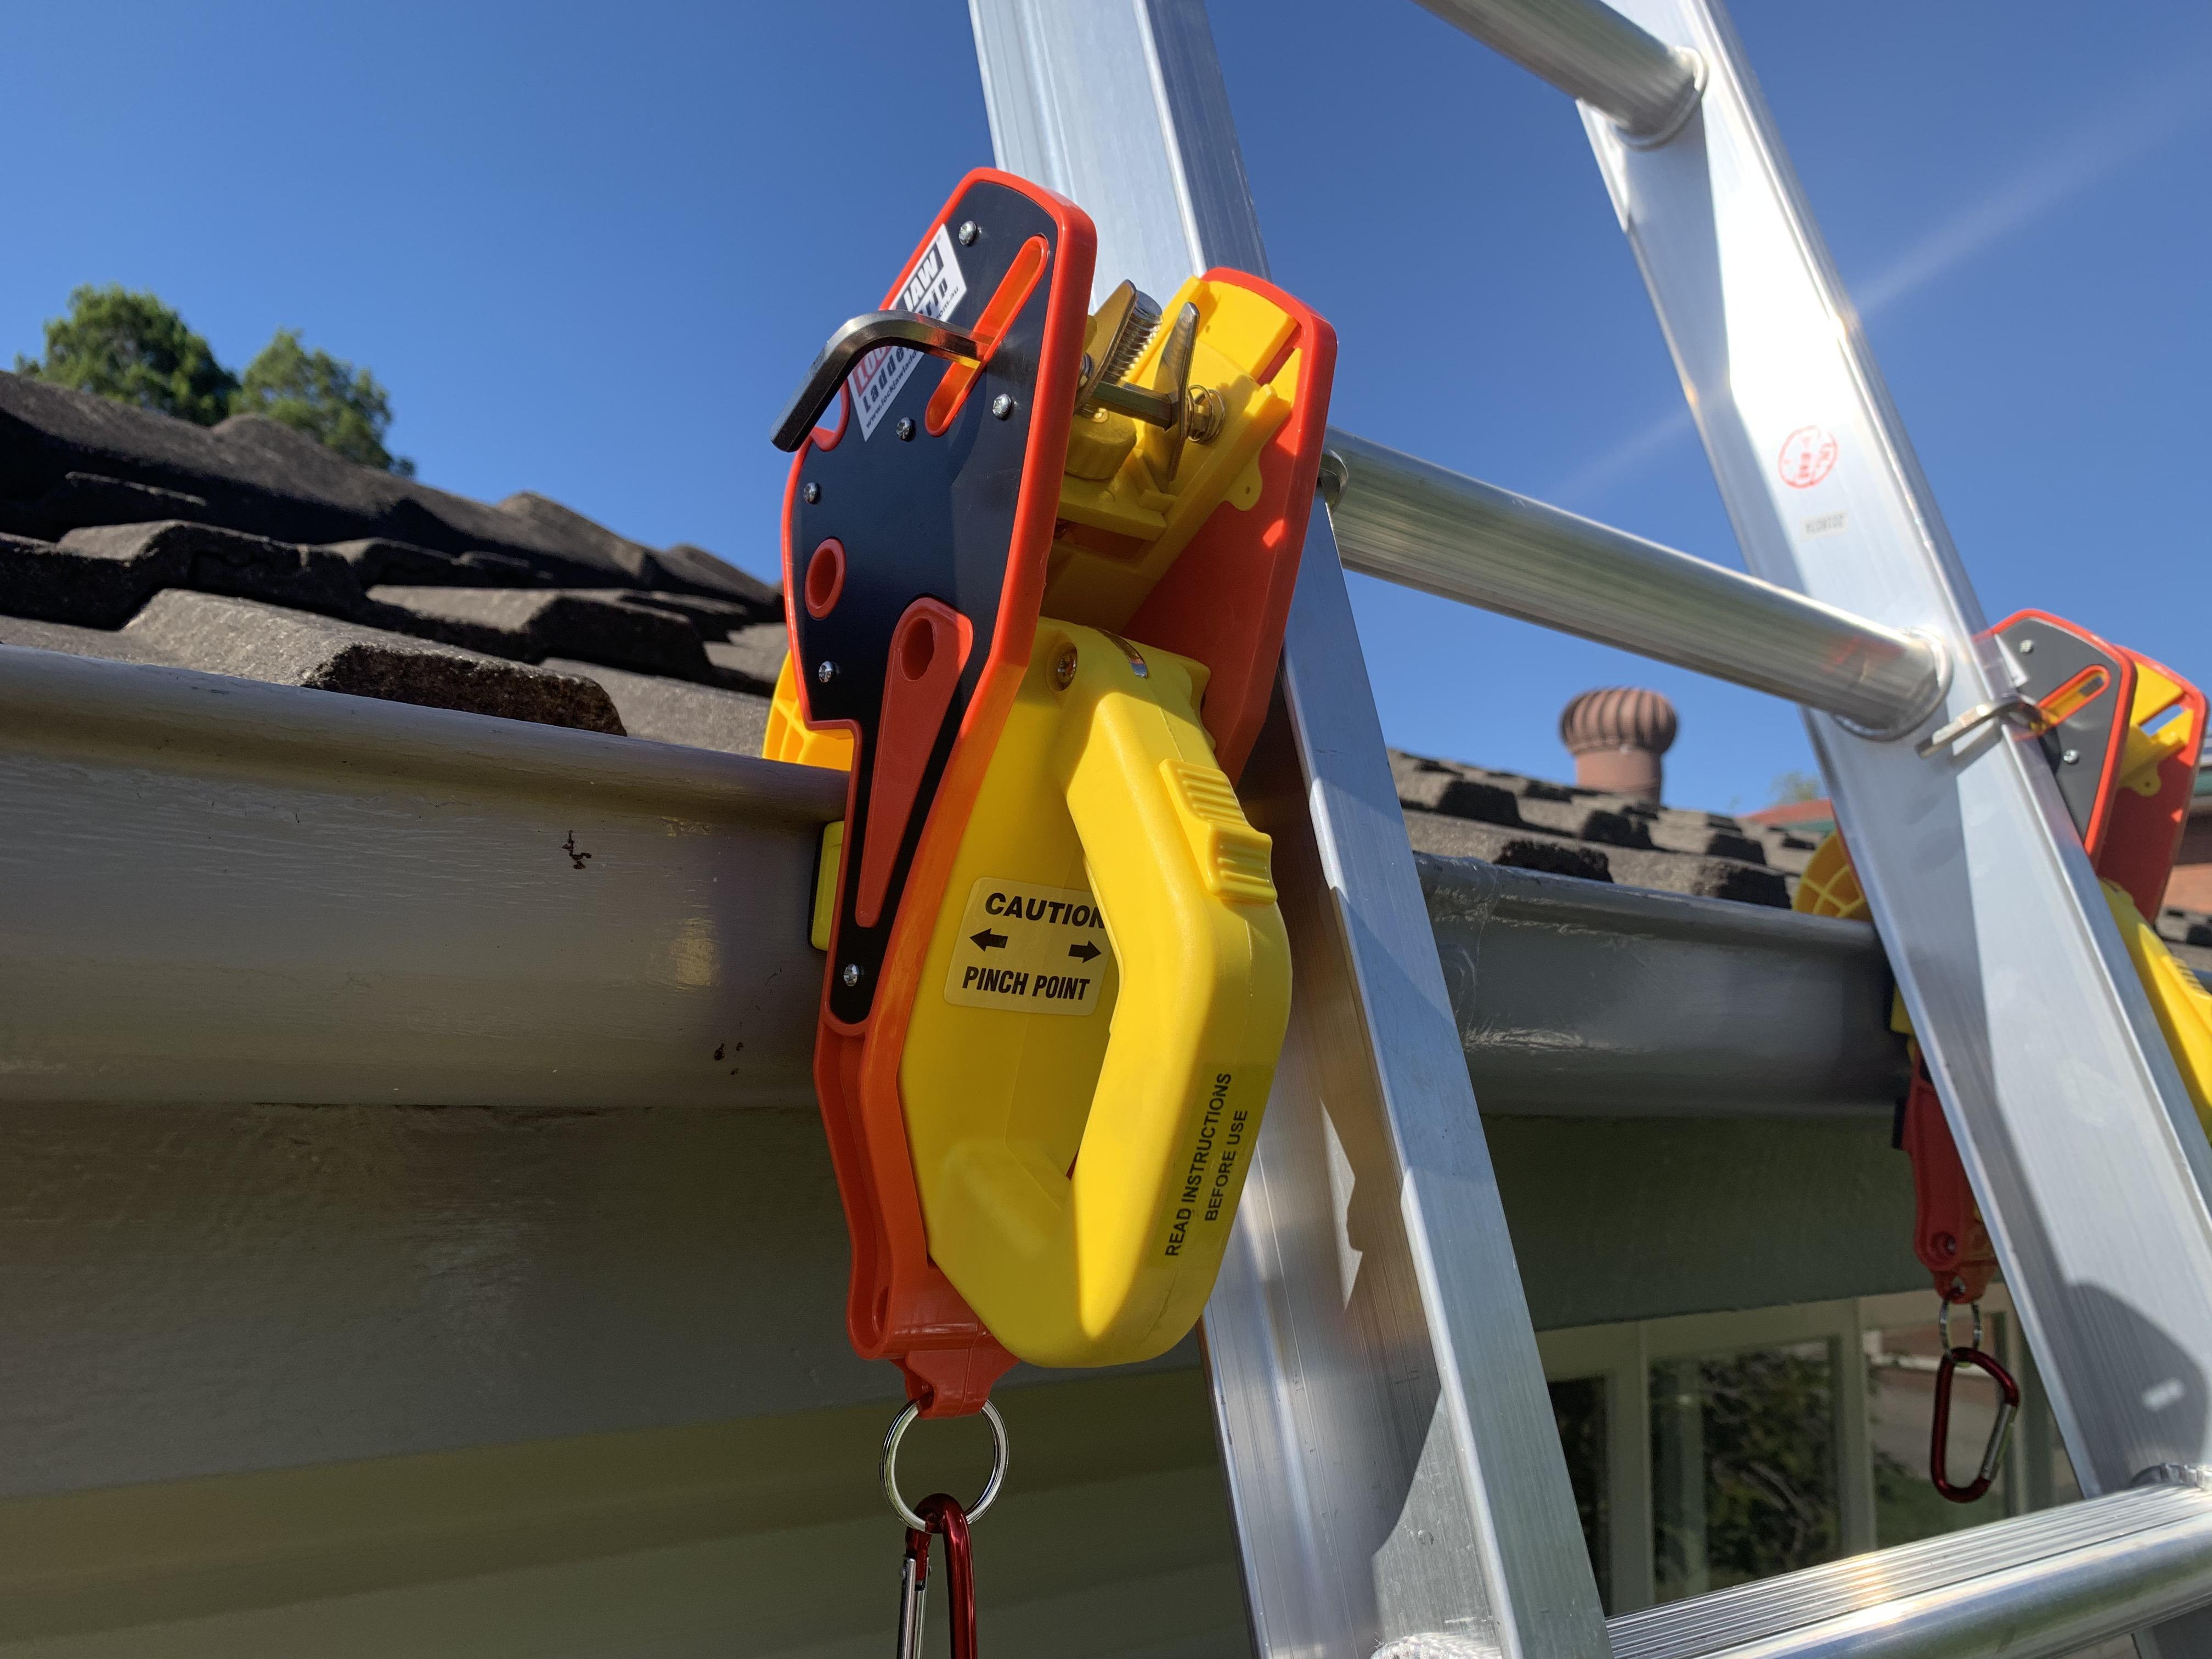 DIY – Home Ladder Safety Bruce's Story